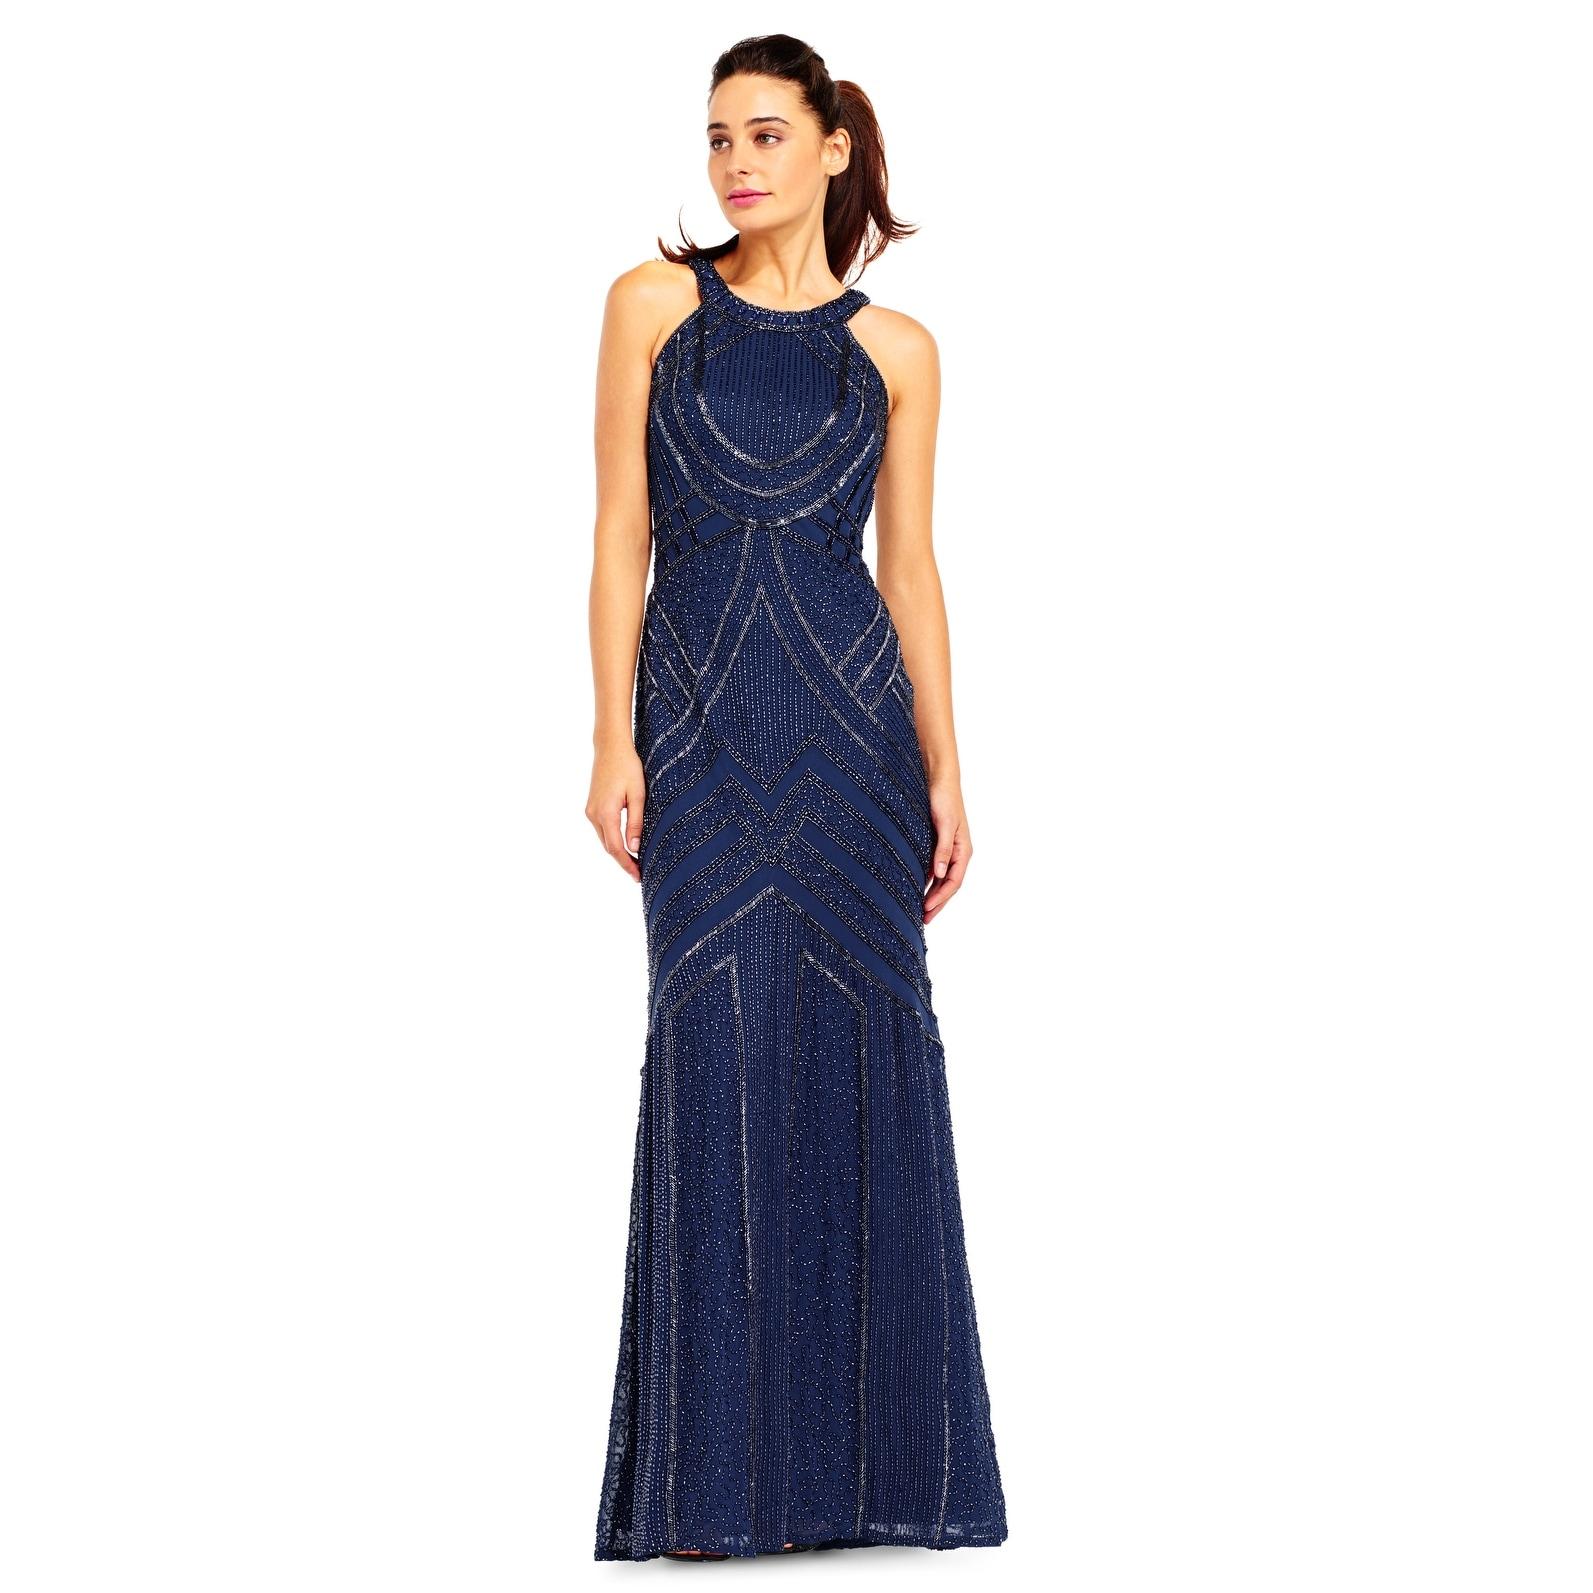 Adrianna Papell Beaded Halter Mermaid Dress with Sheer Back, Deep ...